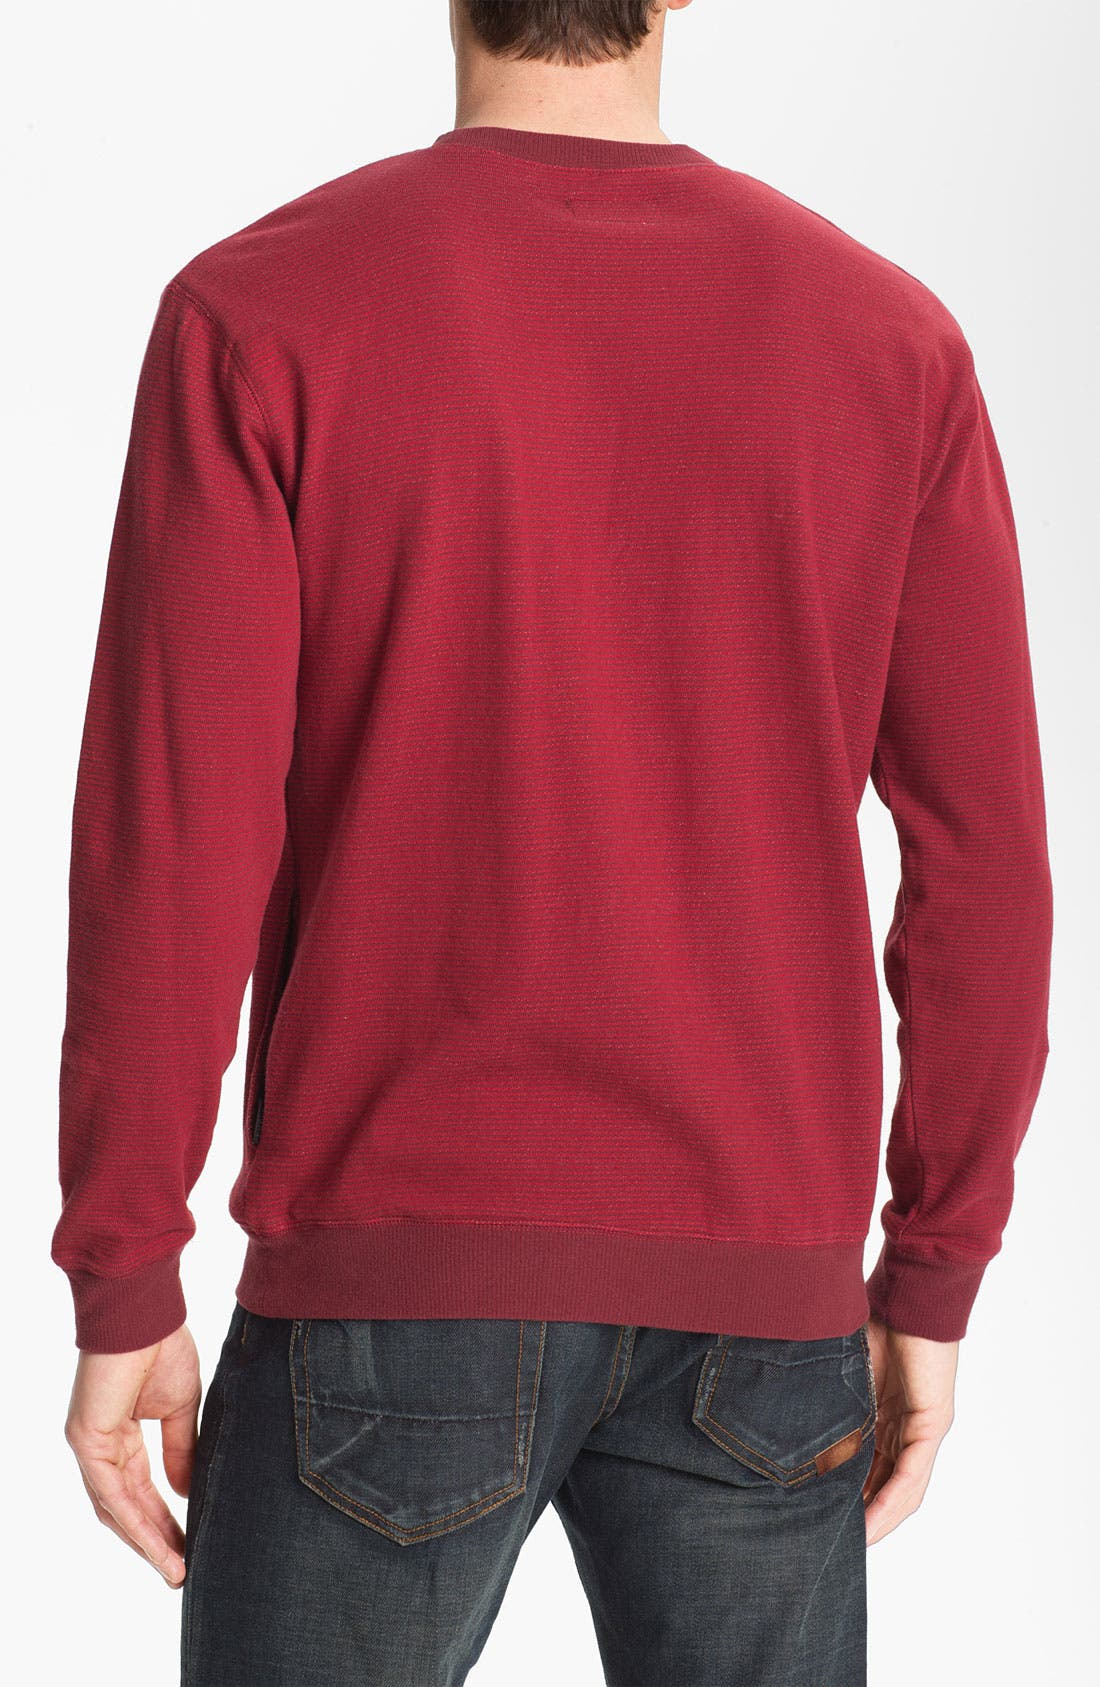 Alternate Image 2  - Brixton 'Partisan' Stripe French Terry Crewneck Sweatshirt